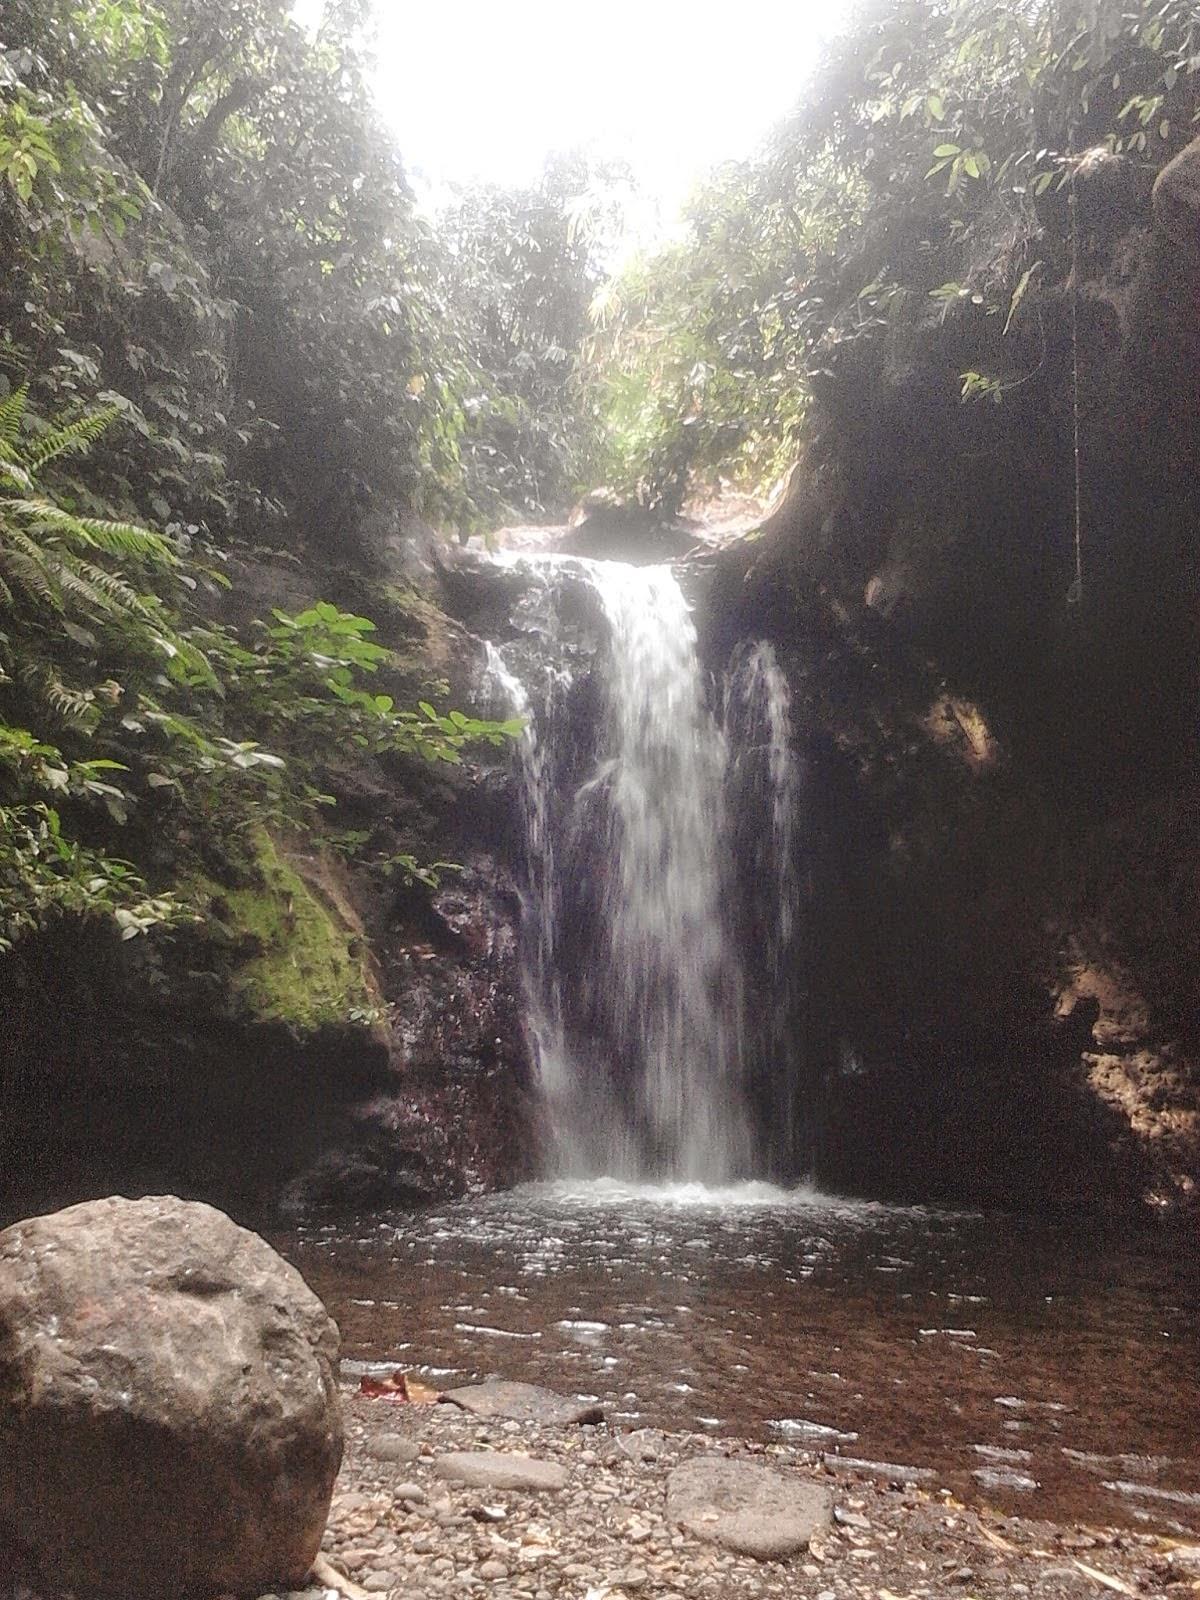 Air terjun Kalibendo, Kecamatan Glagah, Banyuwangi.